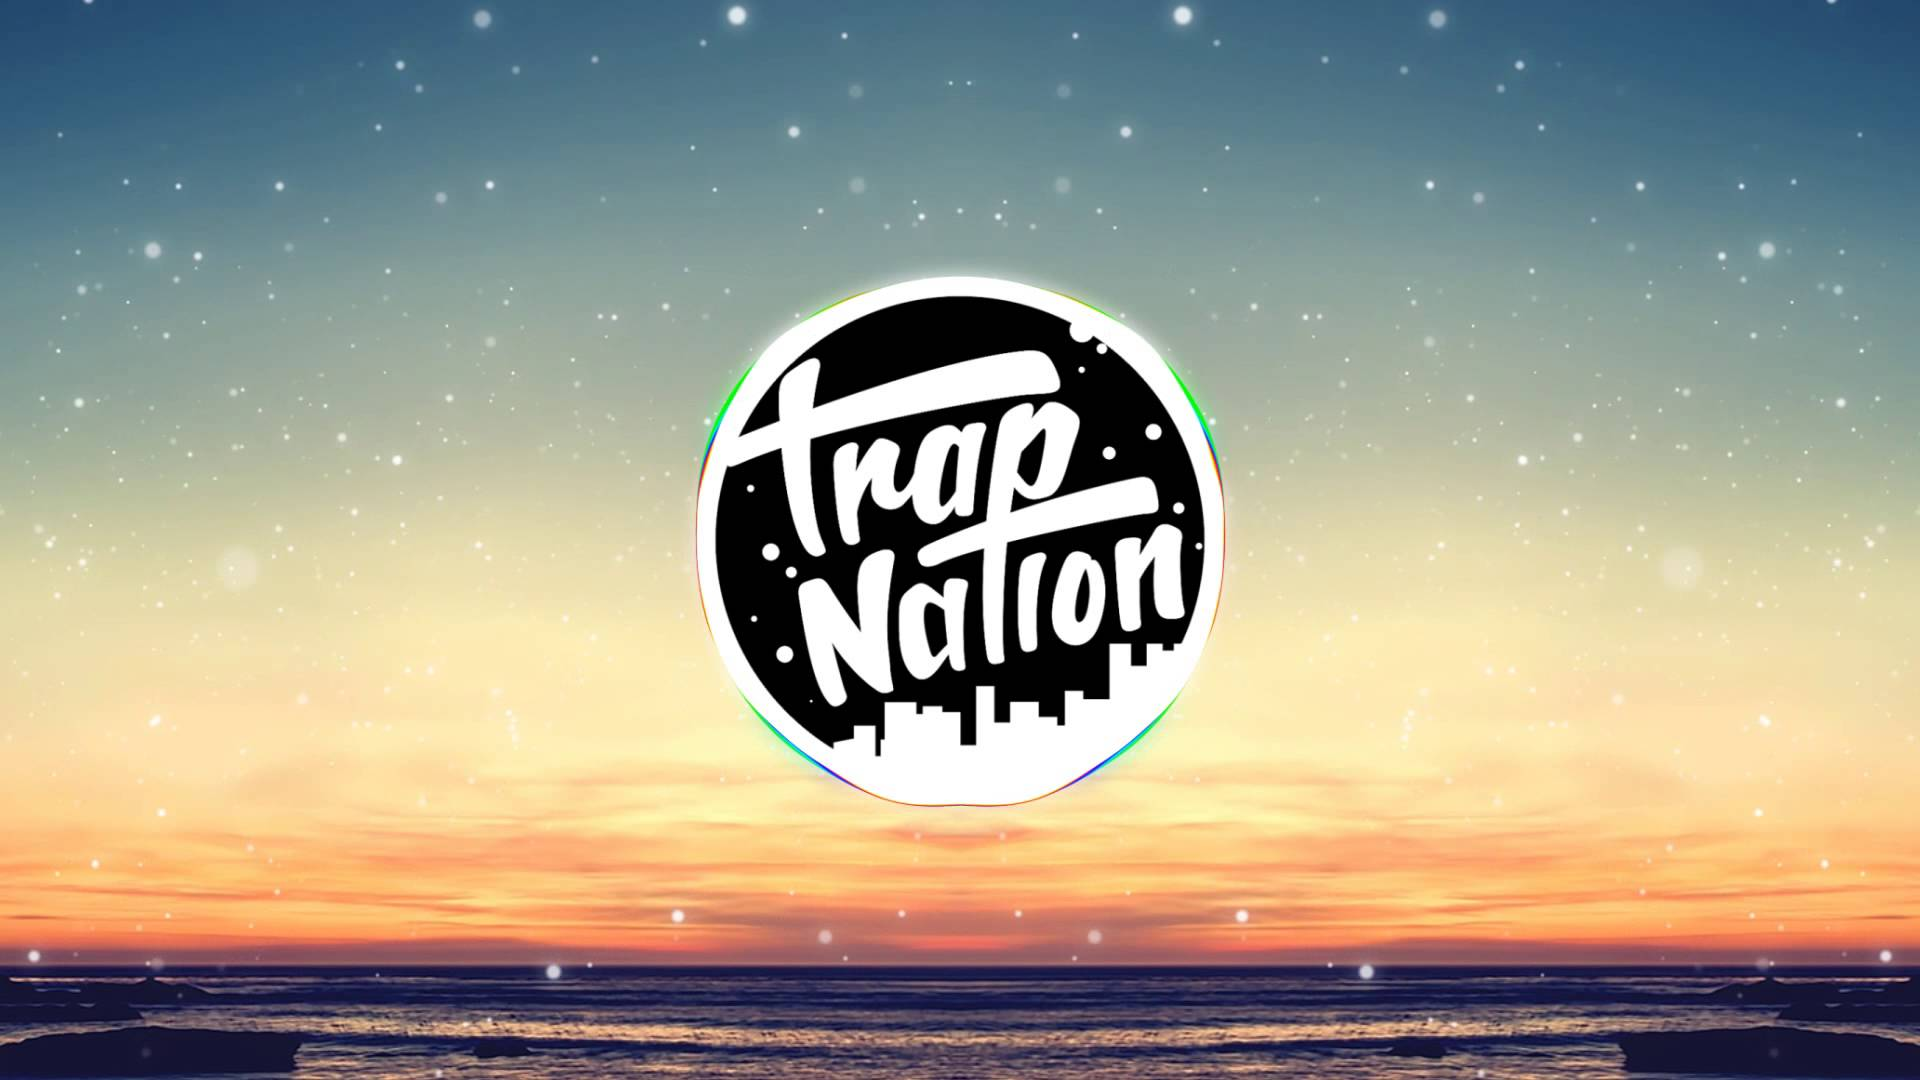 Trap nation wallpaper trap trapnation nation edm - Jpg 1920x1080 Trap Nation Backgrounds